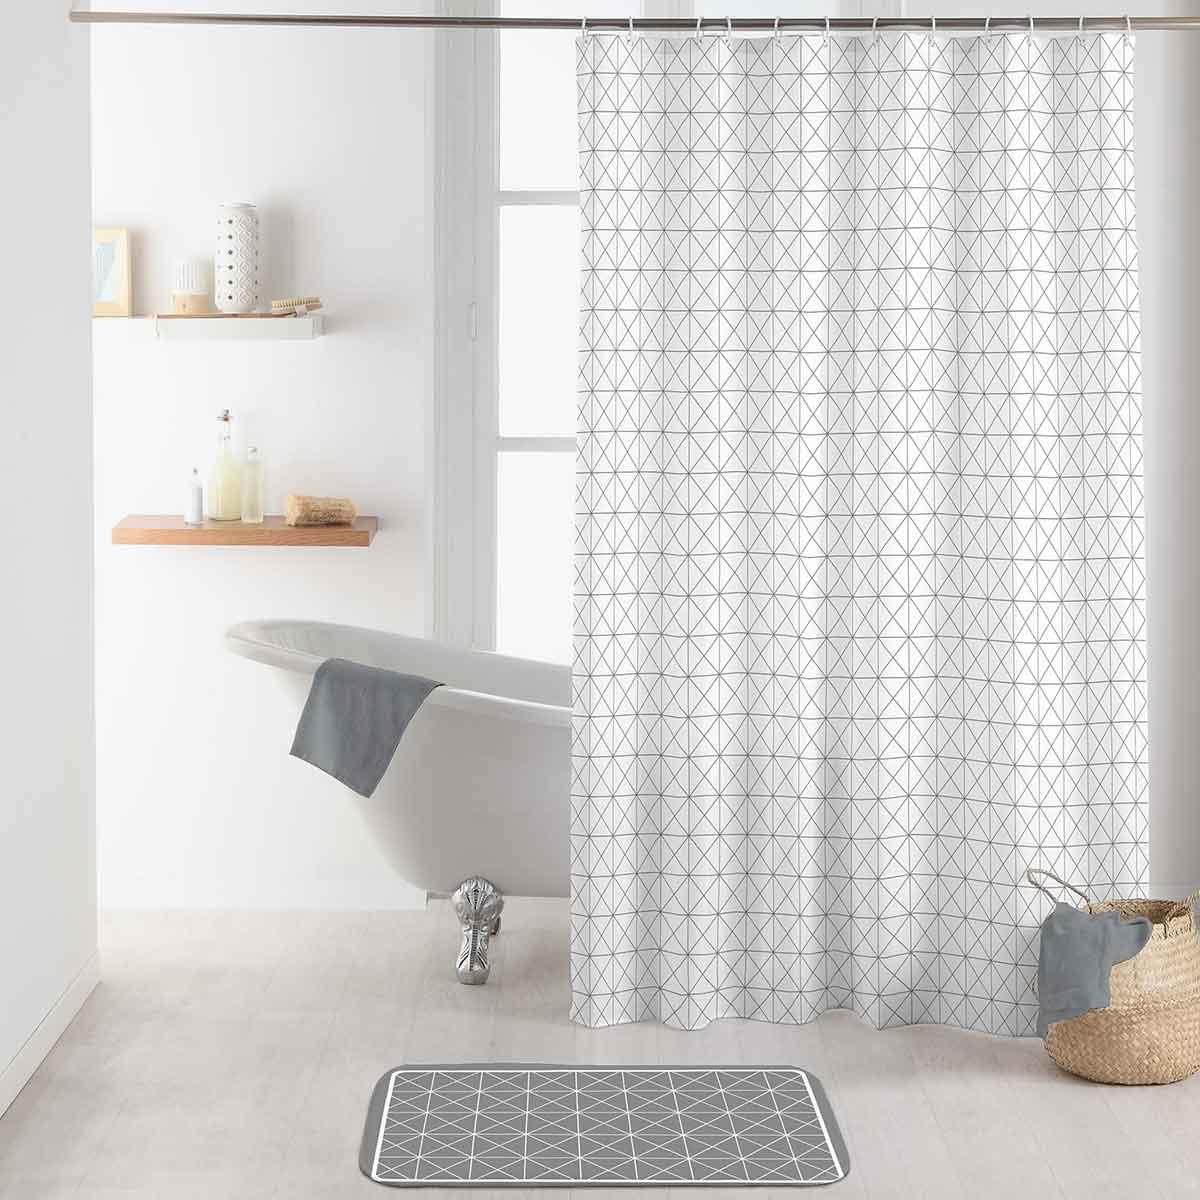 Rideau de Douche Esprit Scandinave (Blanc) - HomeBain : vente en ...